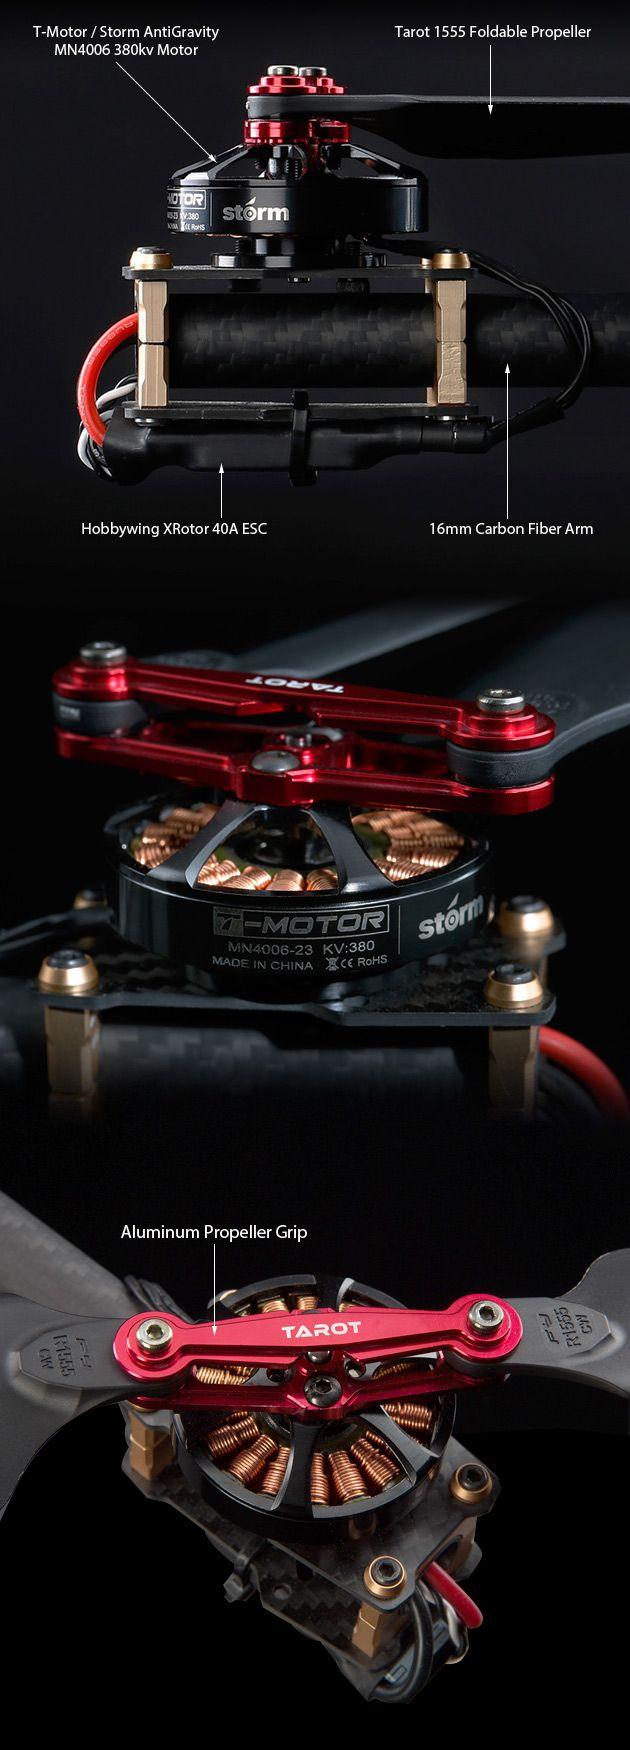 STORM Drone AntiGravity GPS Plate-forme volante (RTF / NAZA V2) - HeliPal